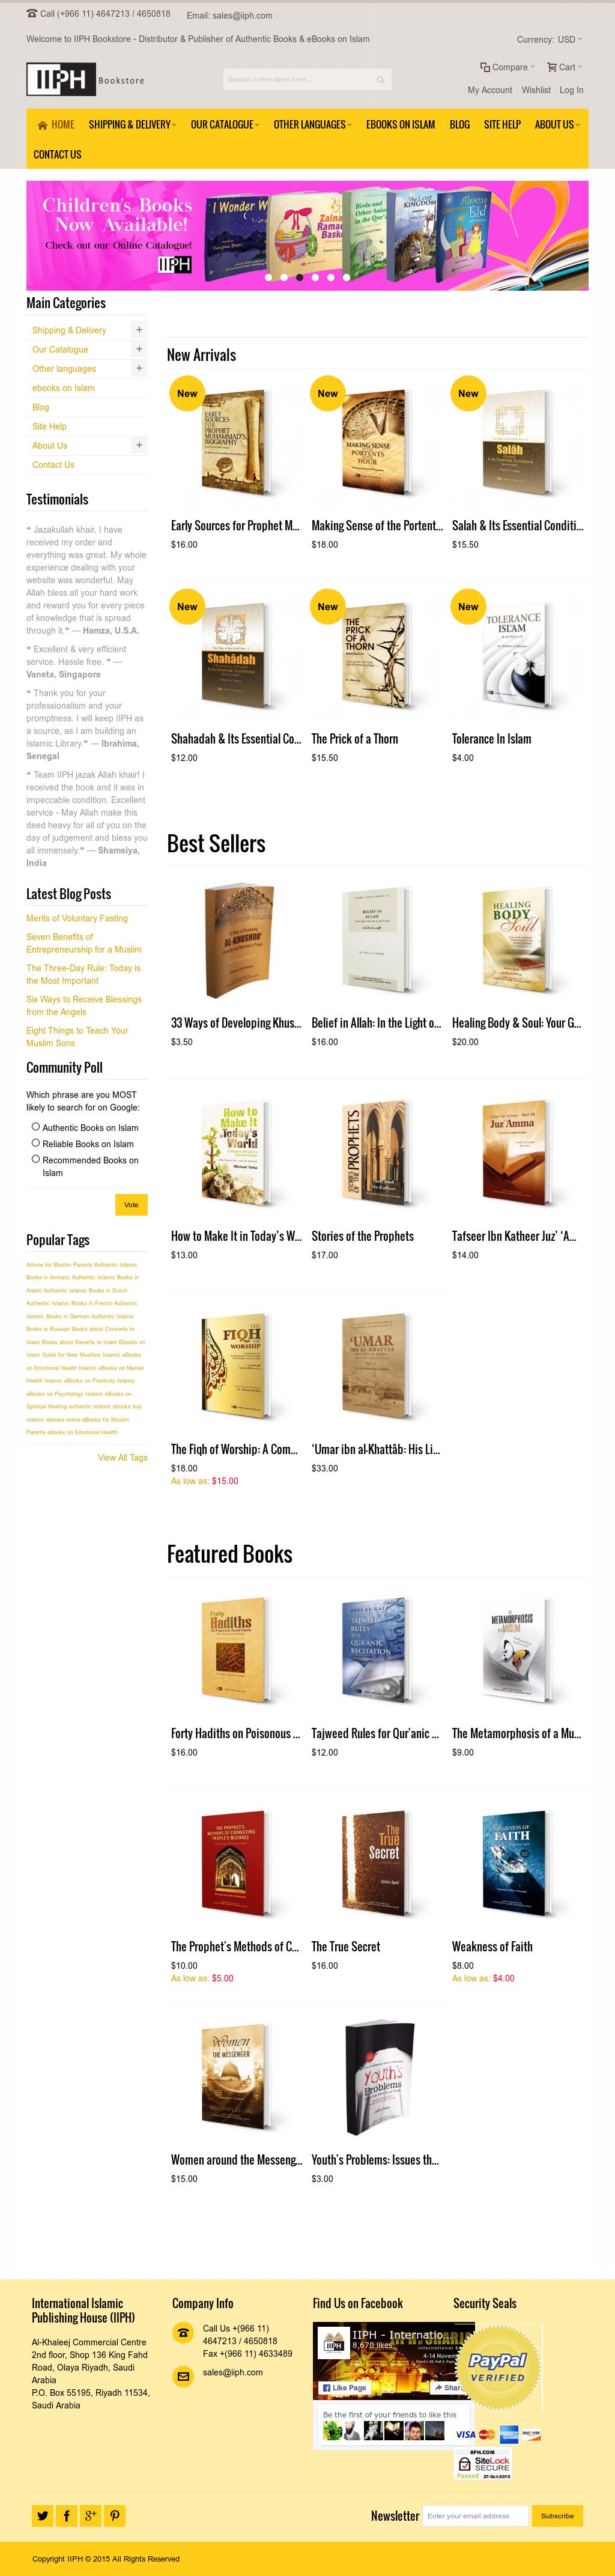 International Islamic Publishing House Competitors, Revenue and